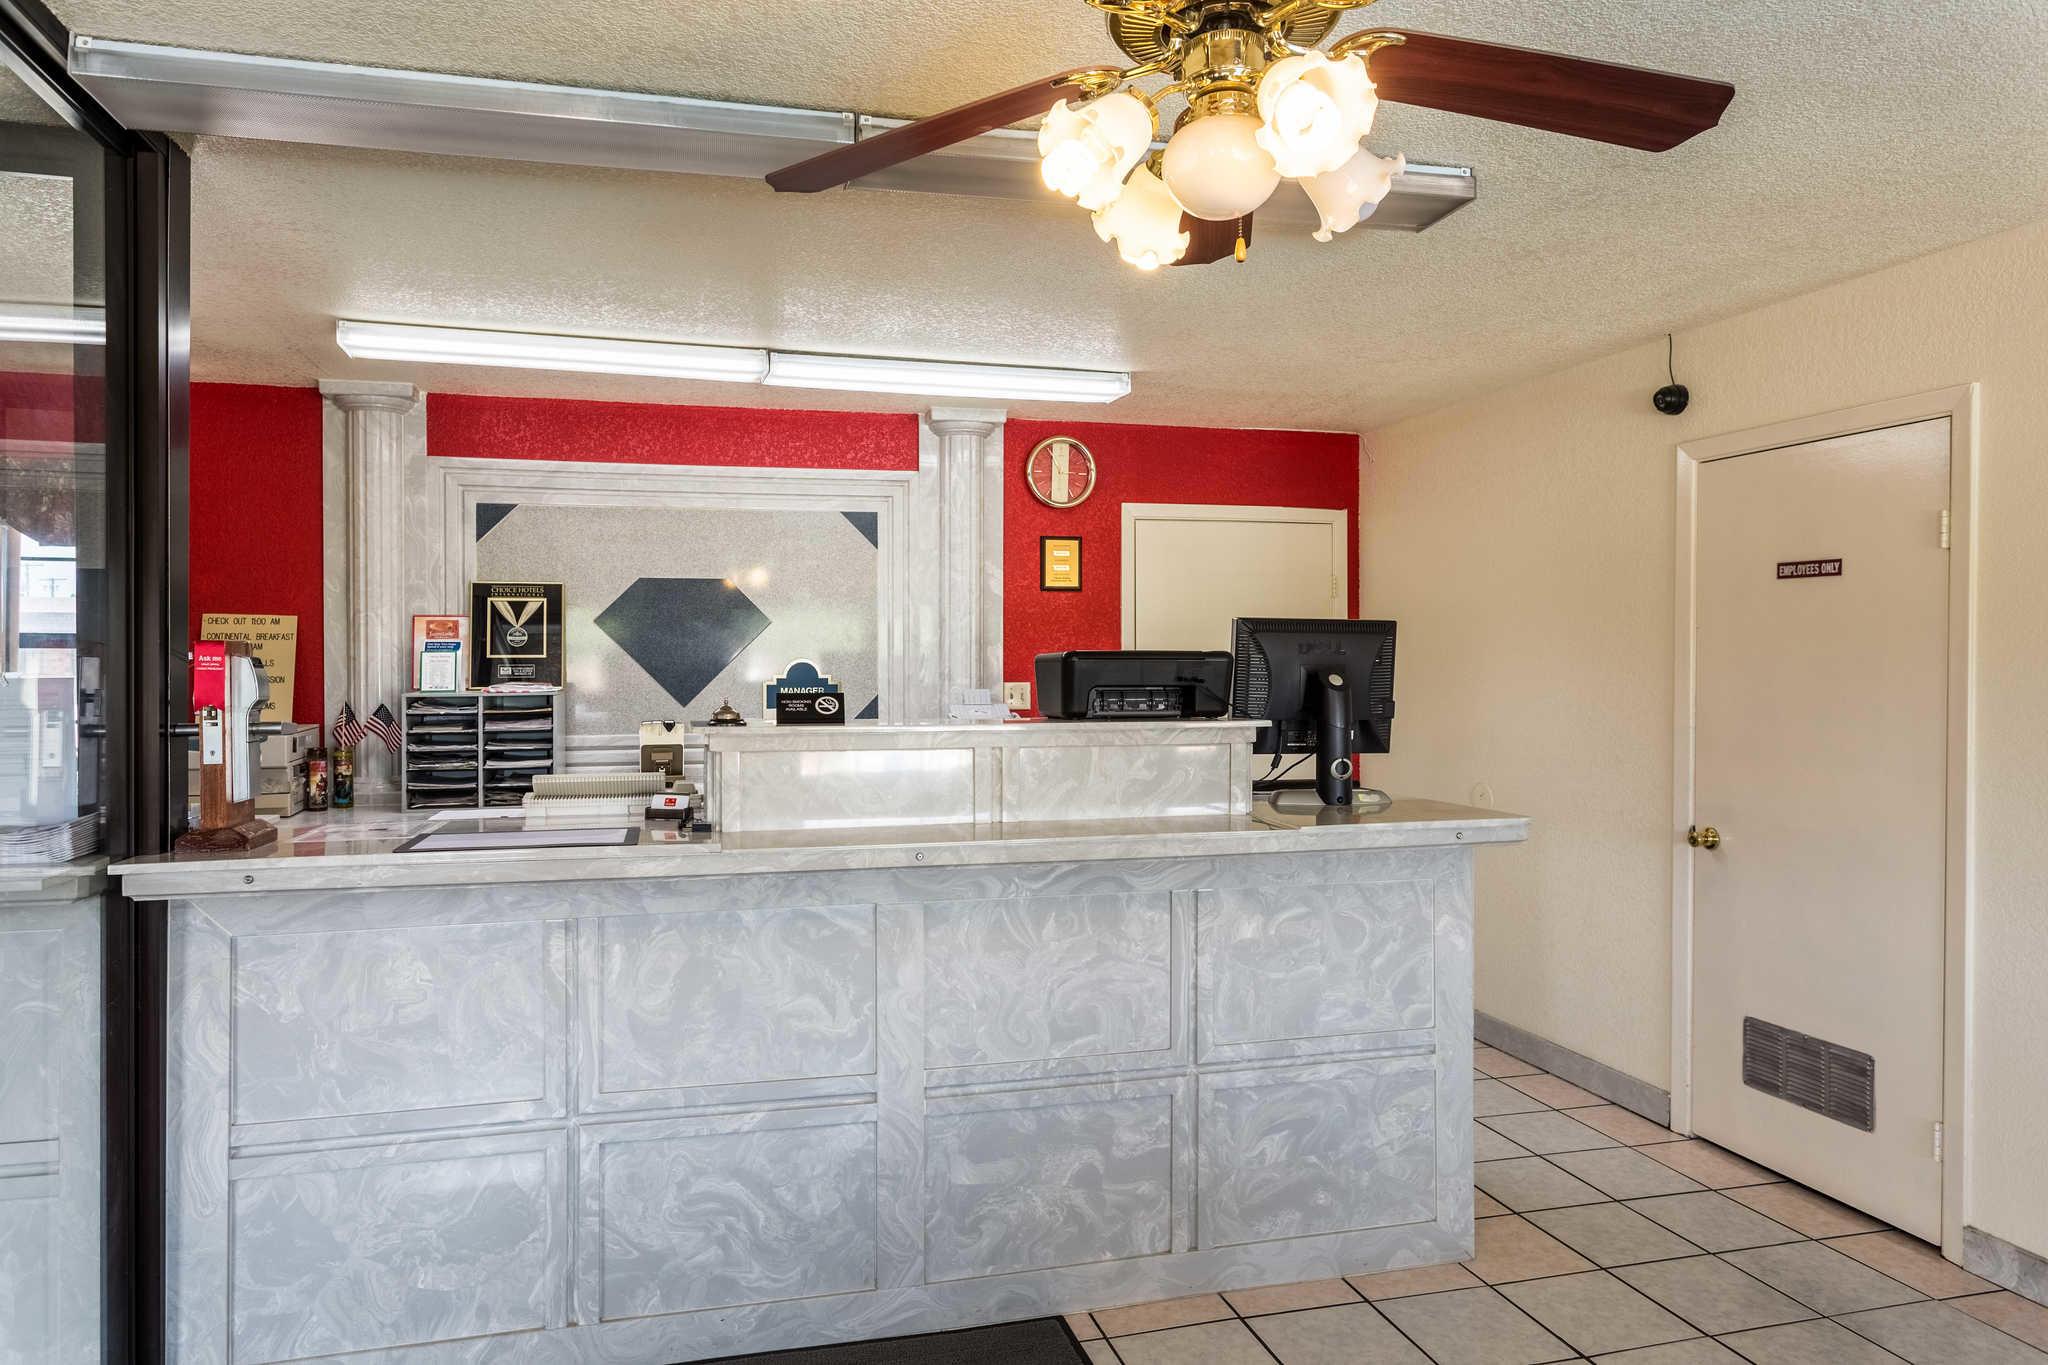 Econo Lodge & Suites image 5